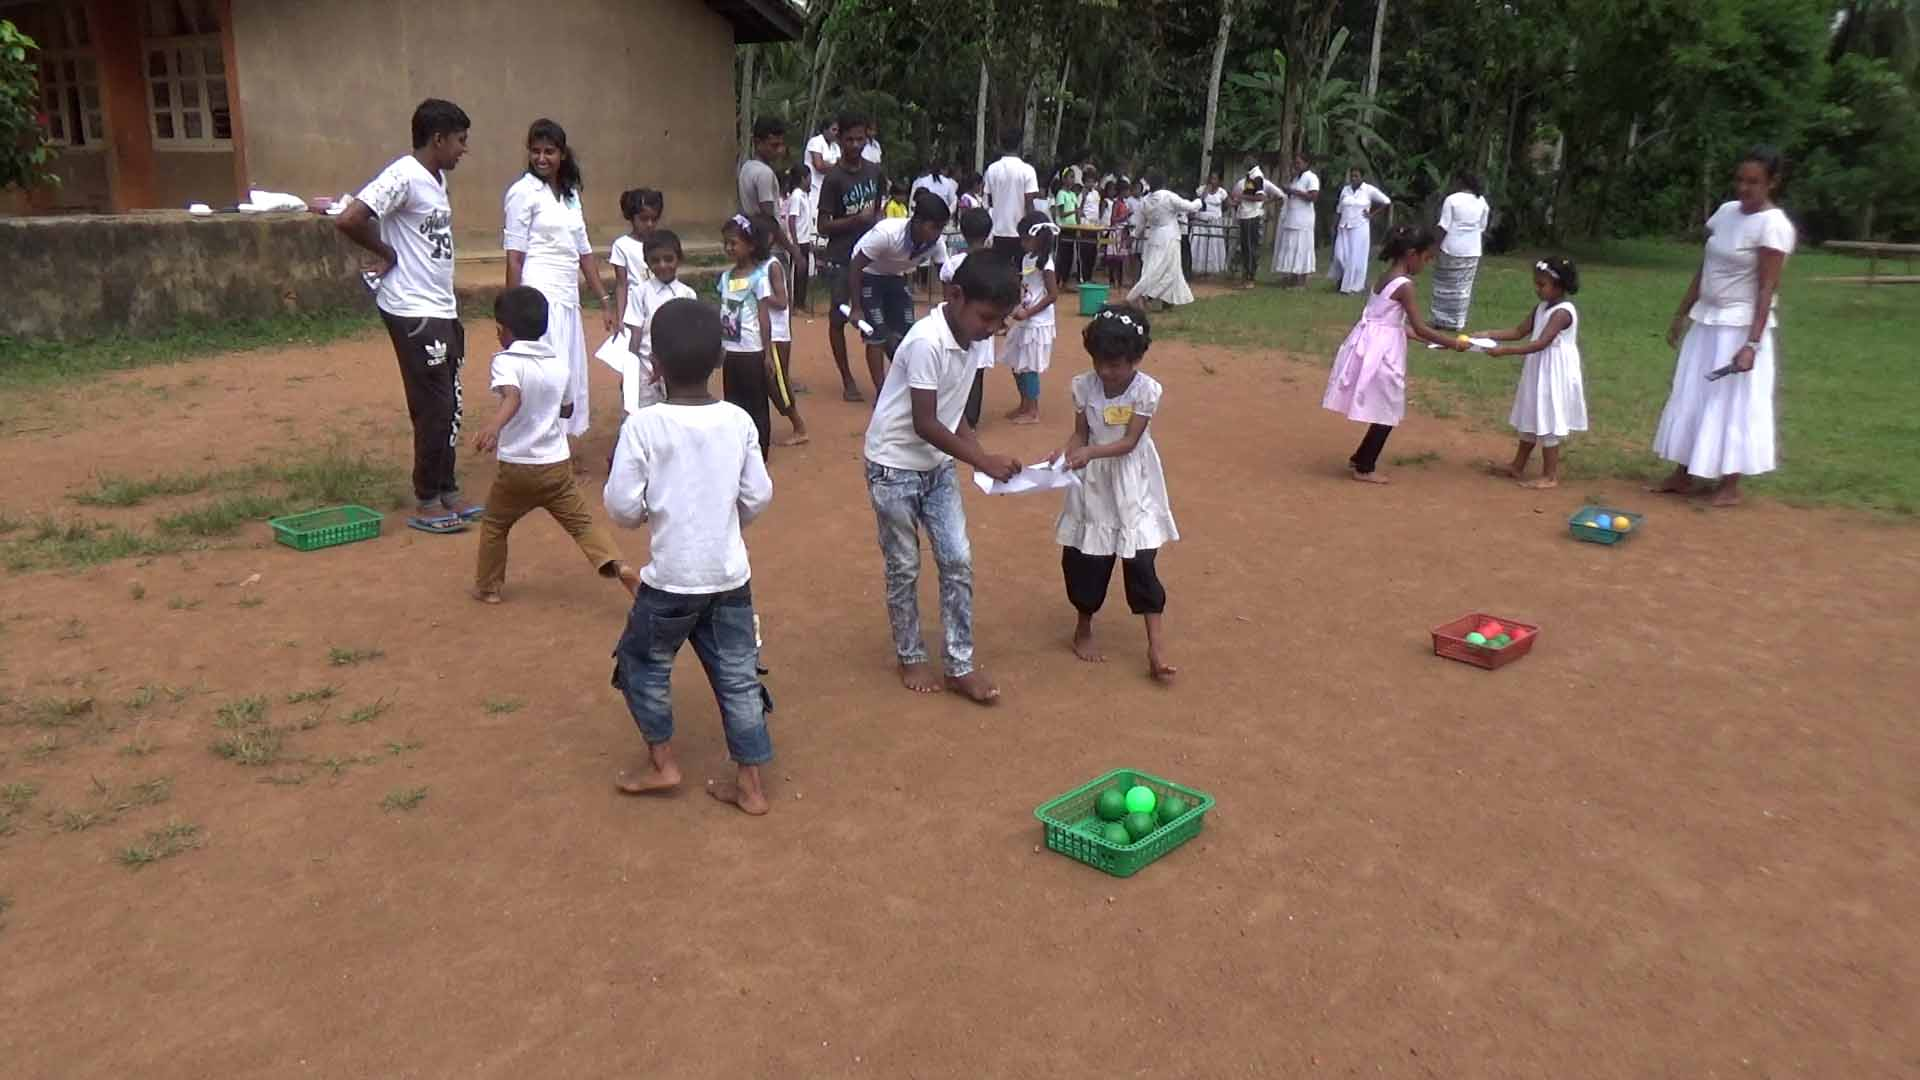 Sati Pasala Mindfulness Camp at Meethirigala Kanishta Vidyalaya-mindful games (27)